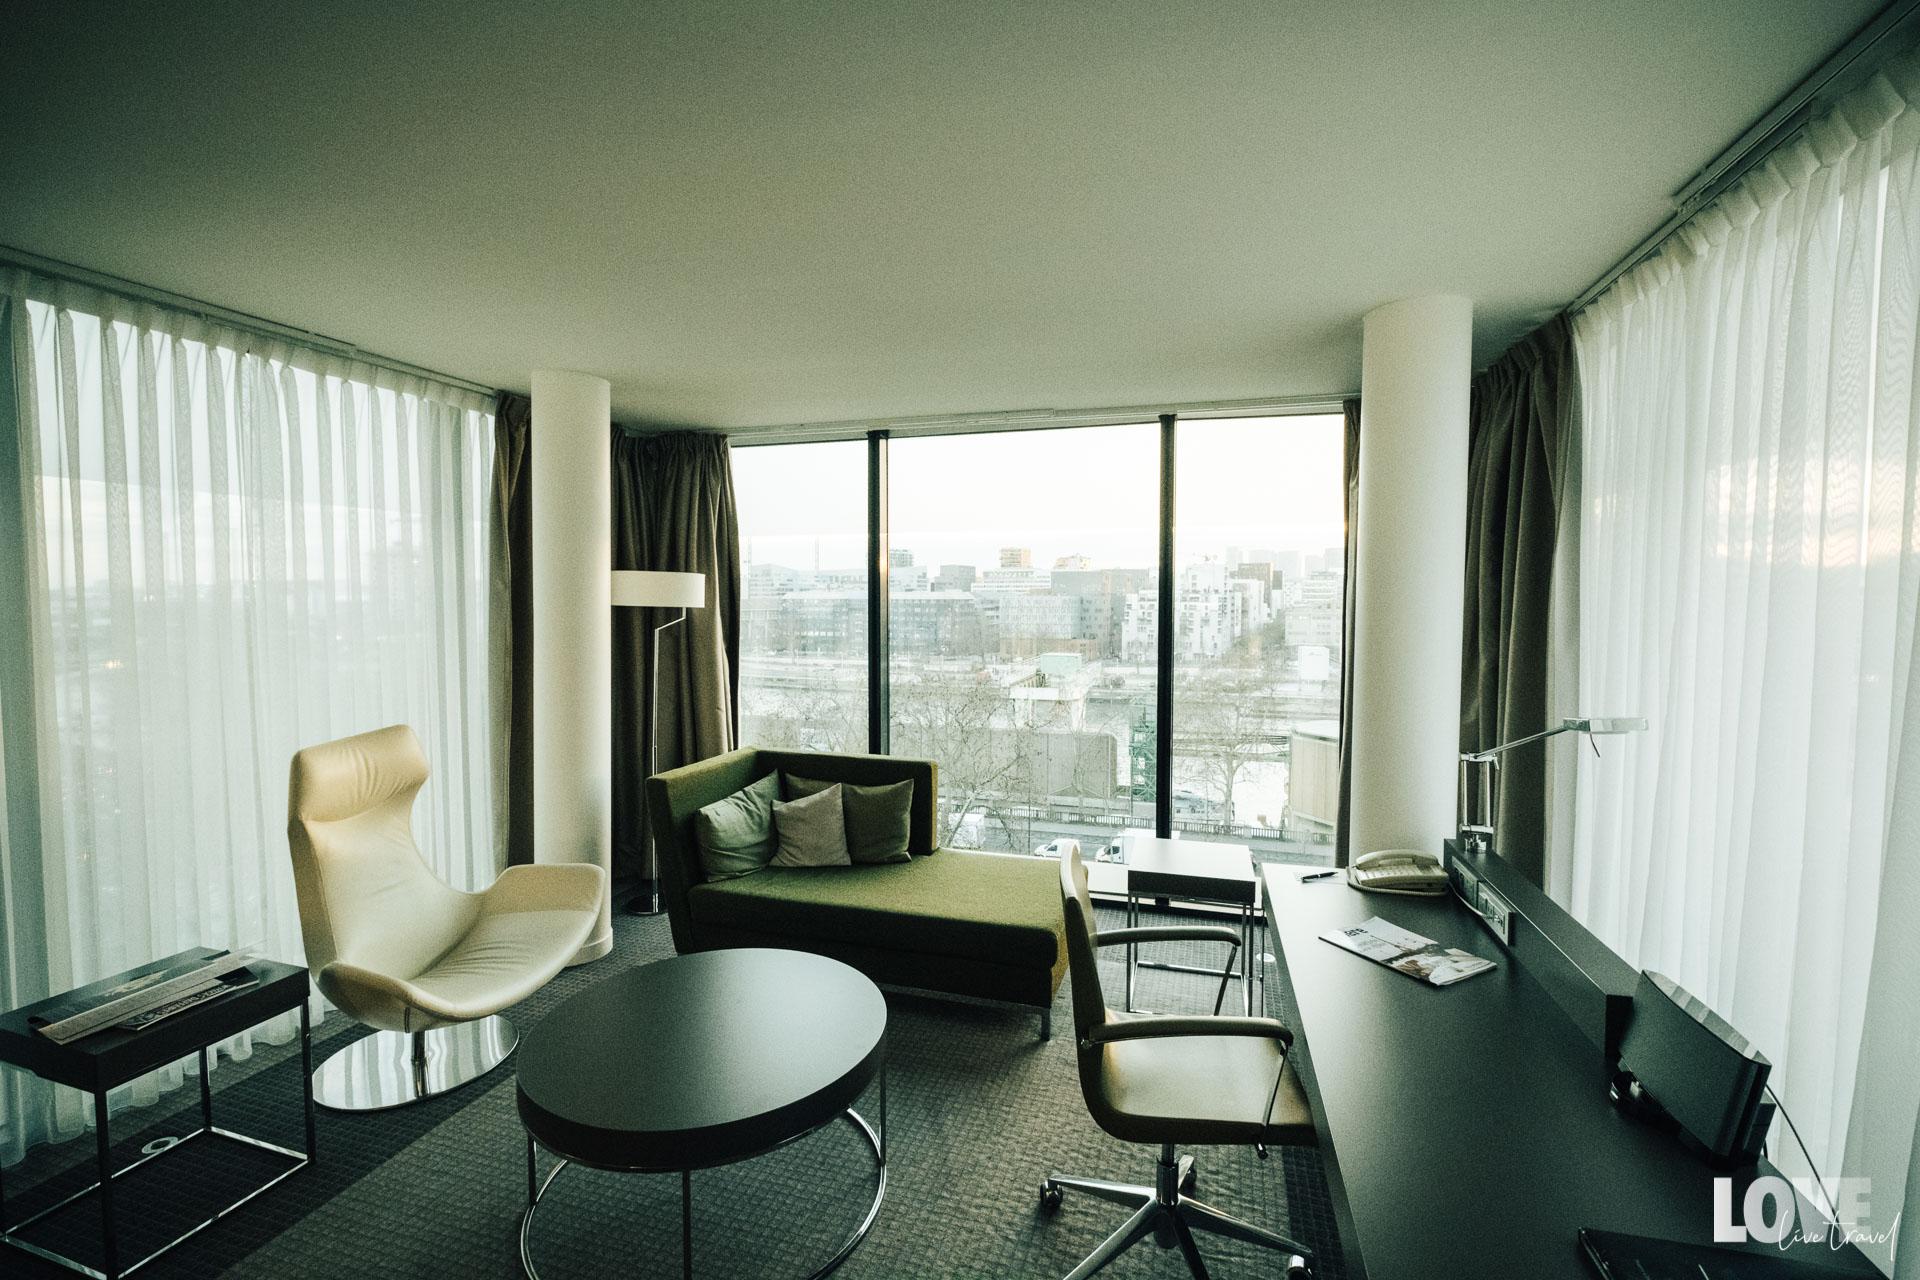 Hôtel Pullman Paris Centre-Bercy